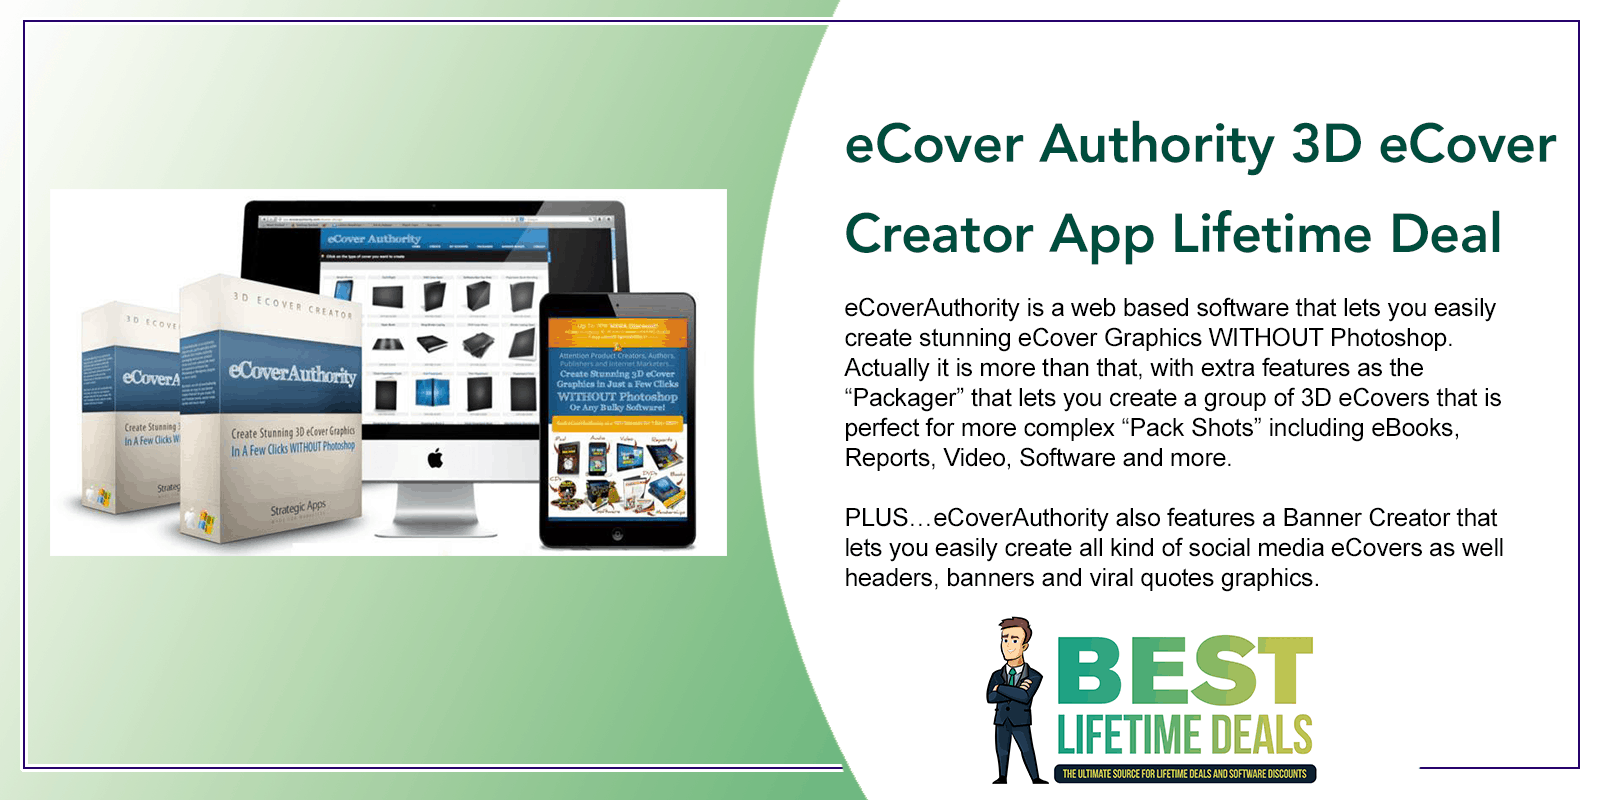 eCover Authority 3D eCover Creator App Lifetime Deal